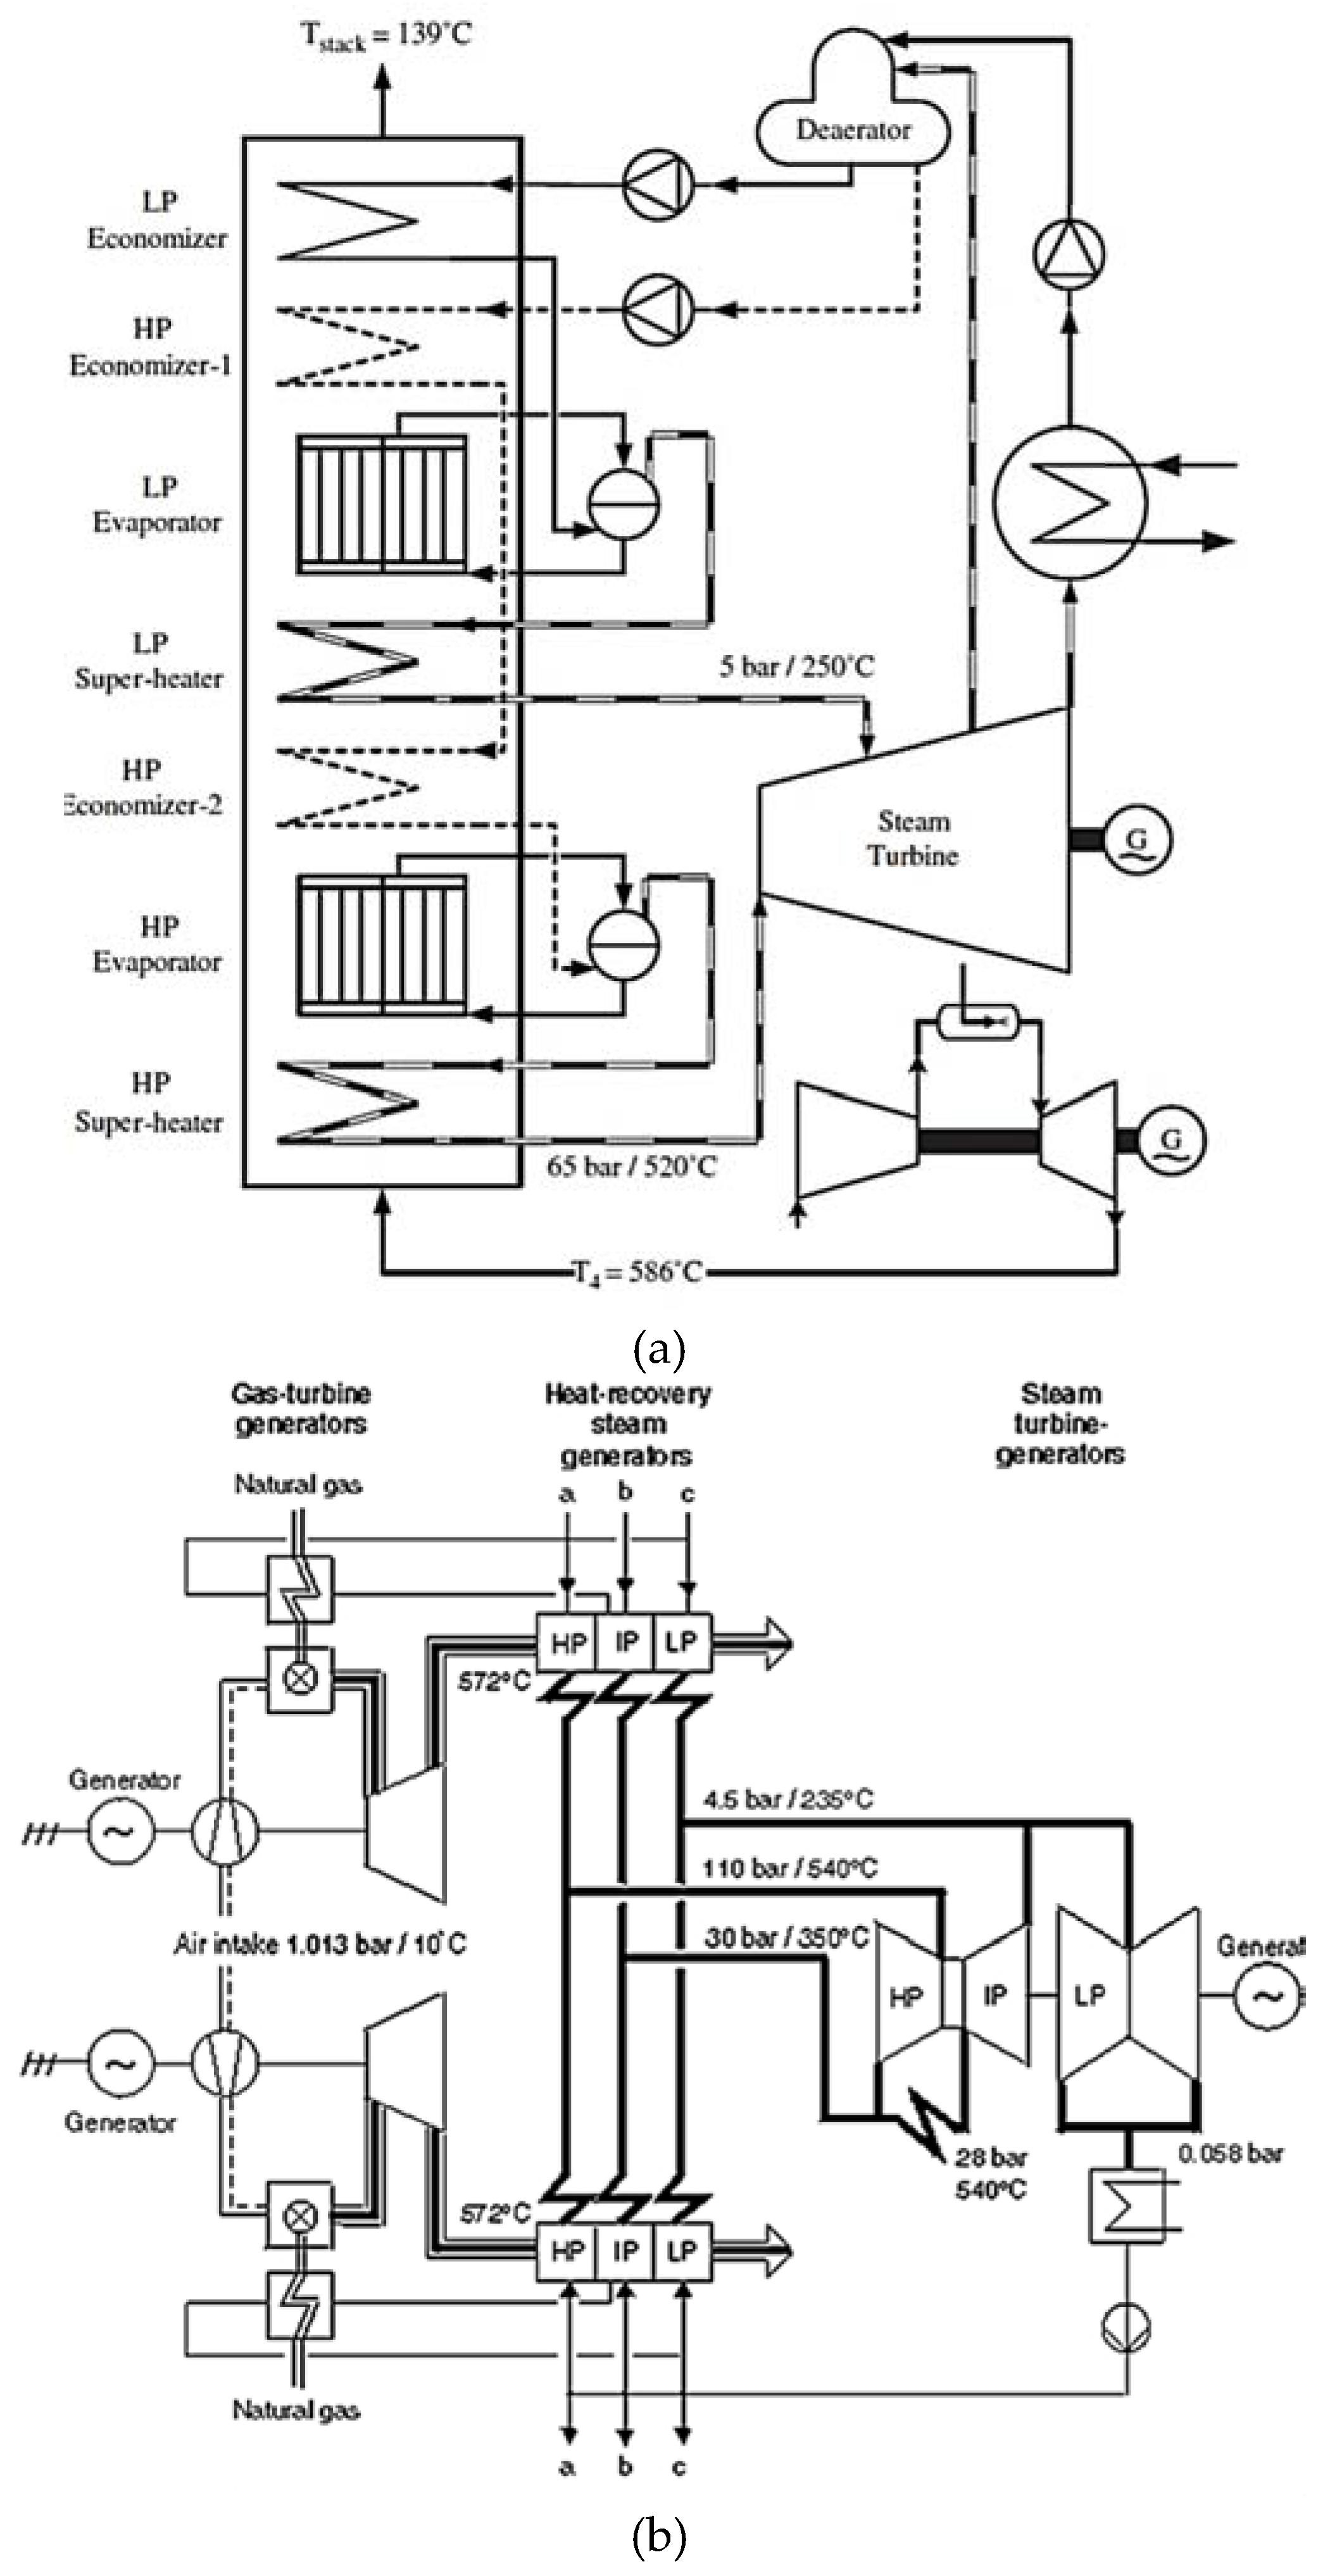 Cogeneration Power-Desalting Plants Using Gas Turbine